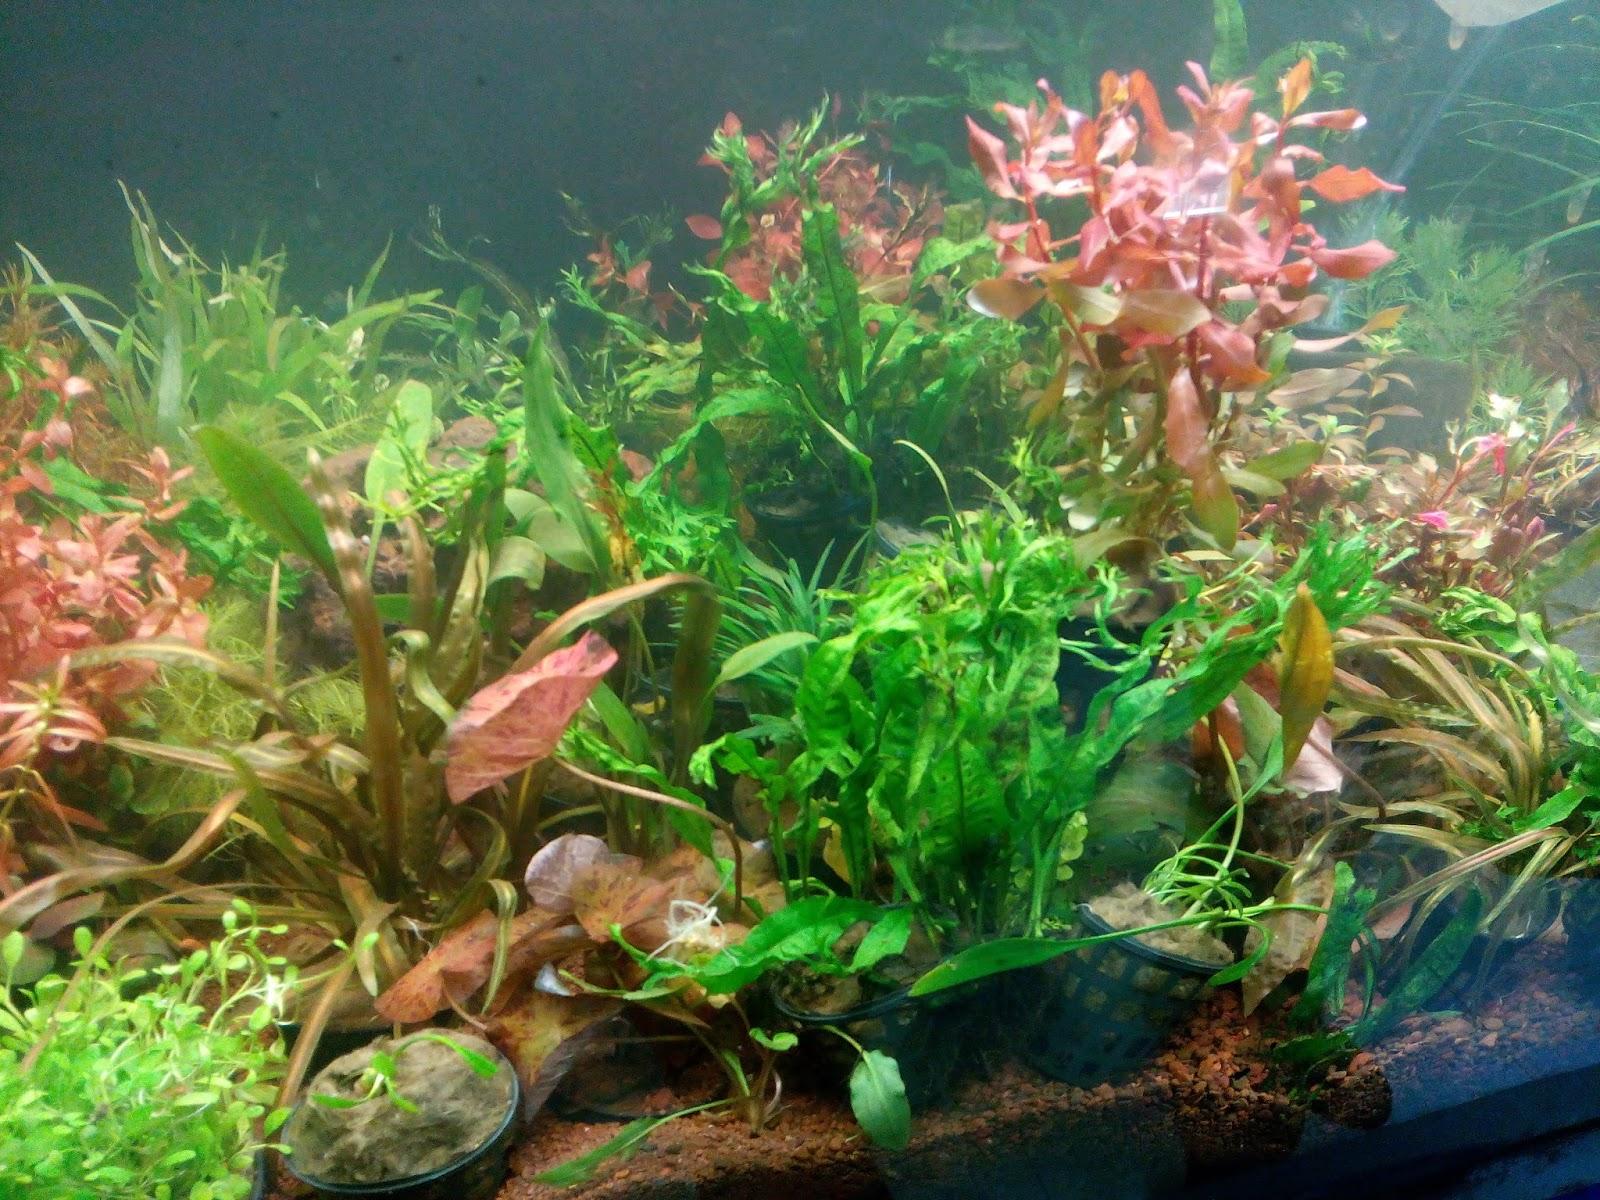 joe s aquaworld for fishes mumbai india 9833898901 live aquarium plants available for